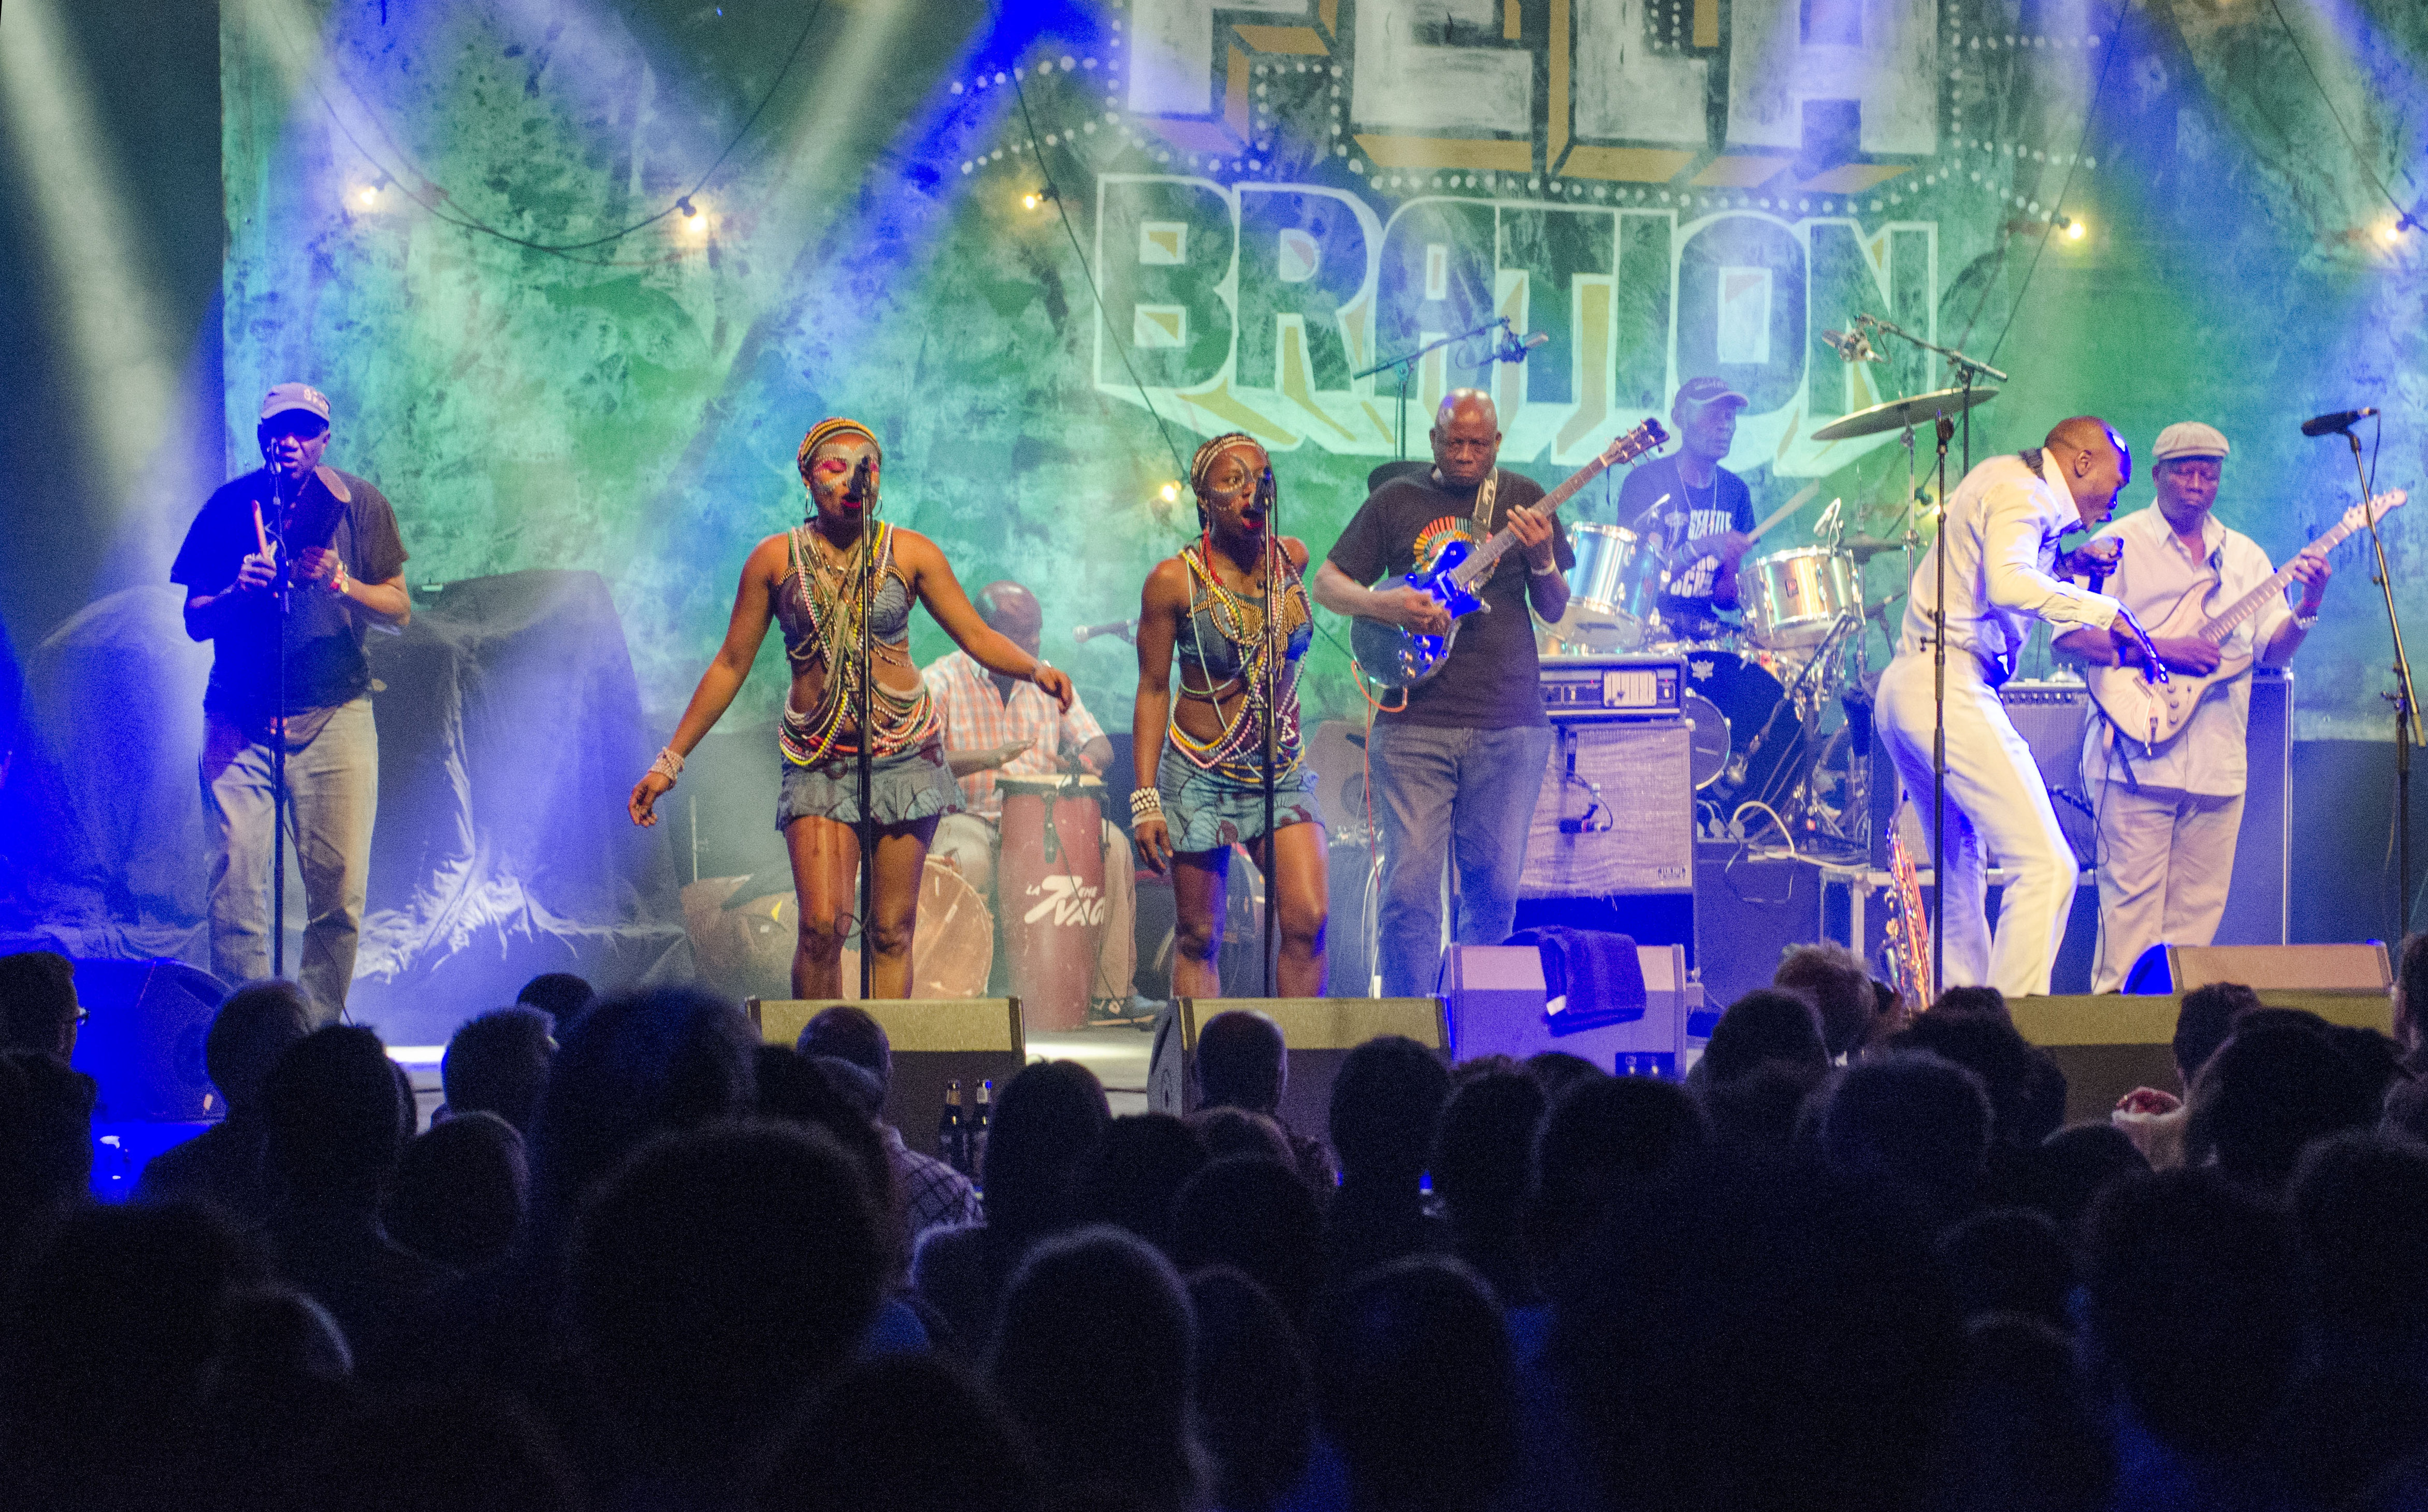 Concert fotografie 2015   Seun Anikulapo Kuti & Egypt 80